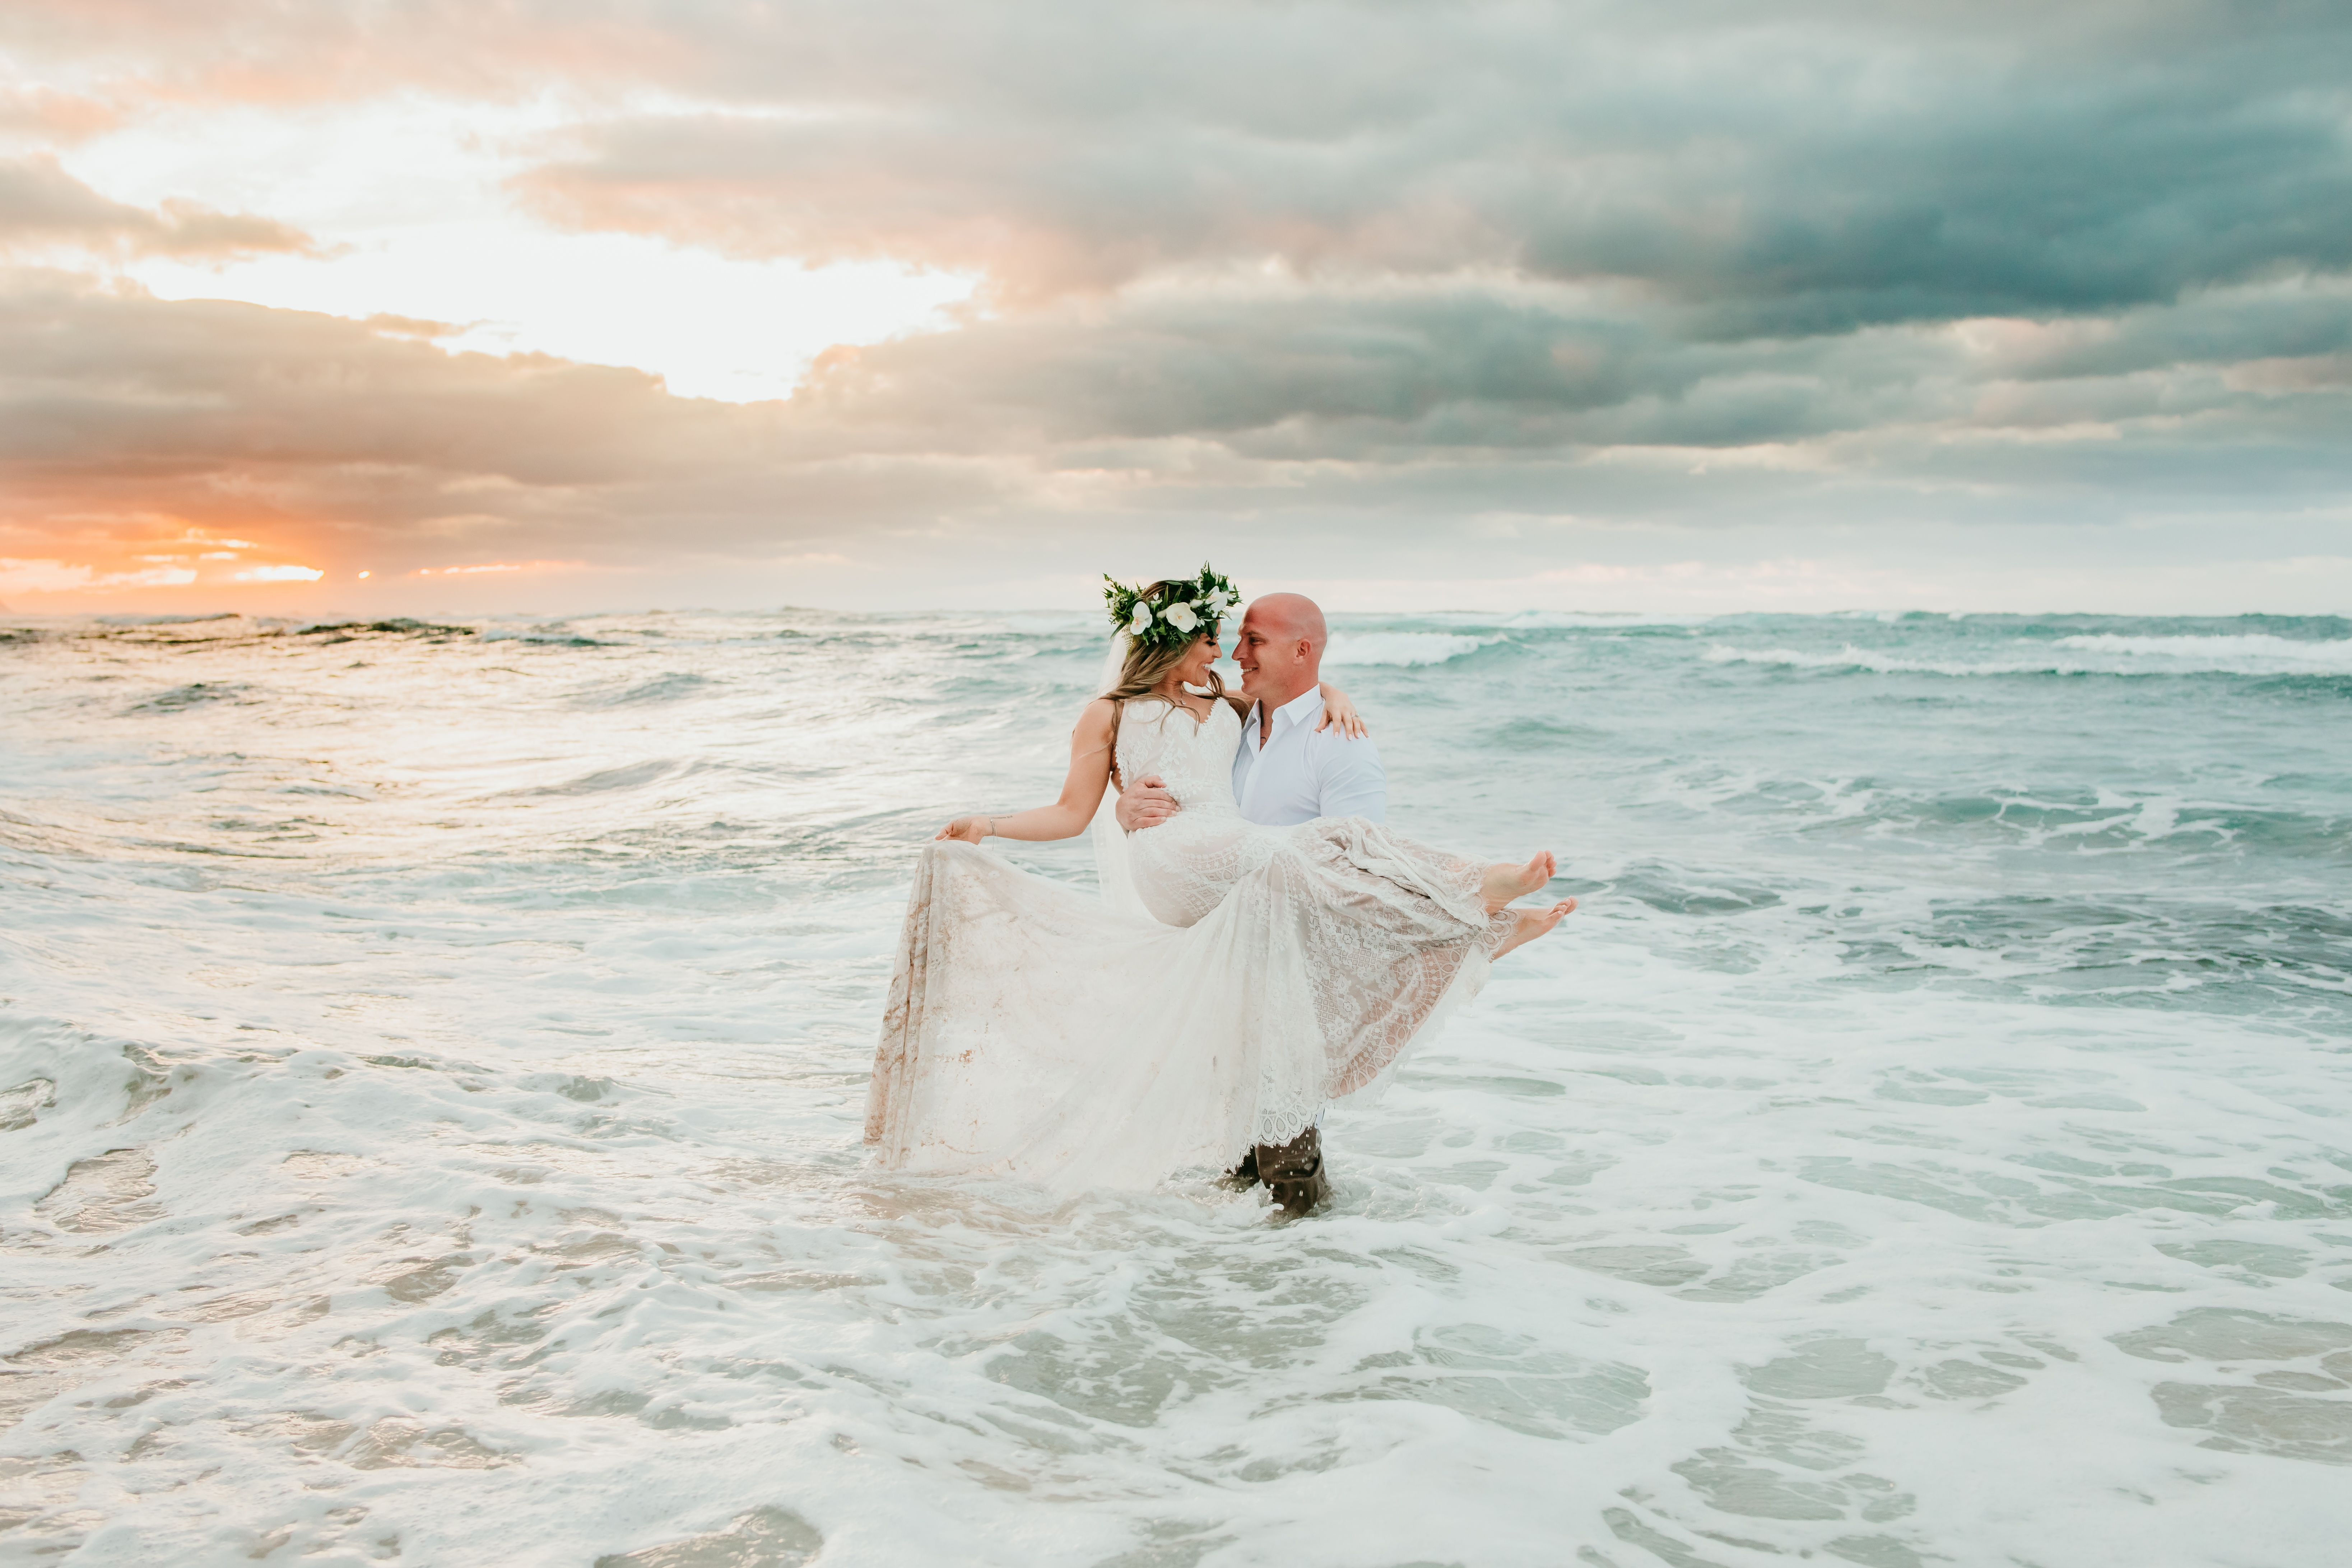 Sunset Wedding Water Poses Hawaii Wedding Photos At Sunset On The